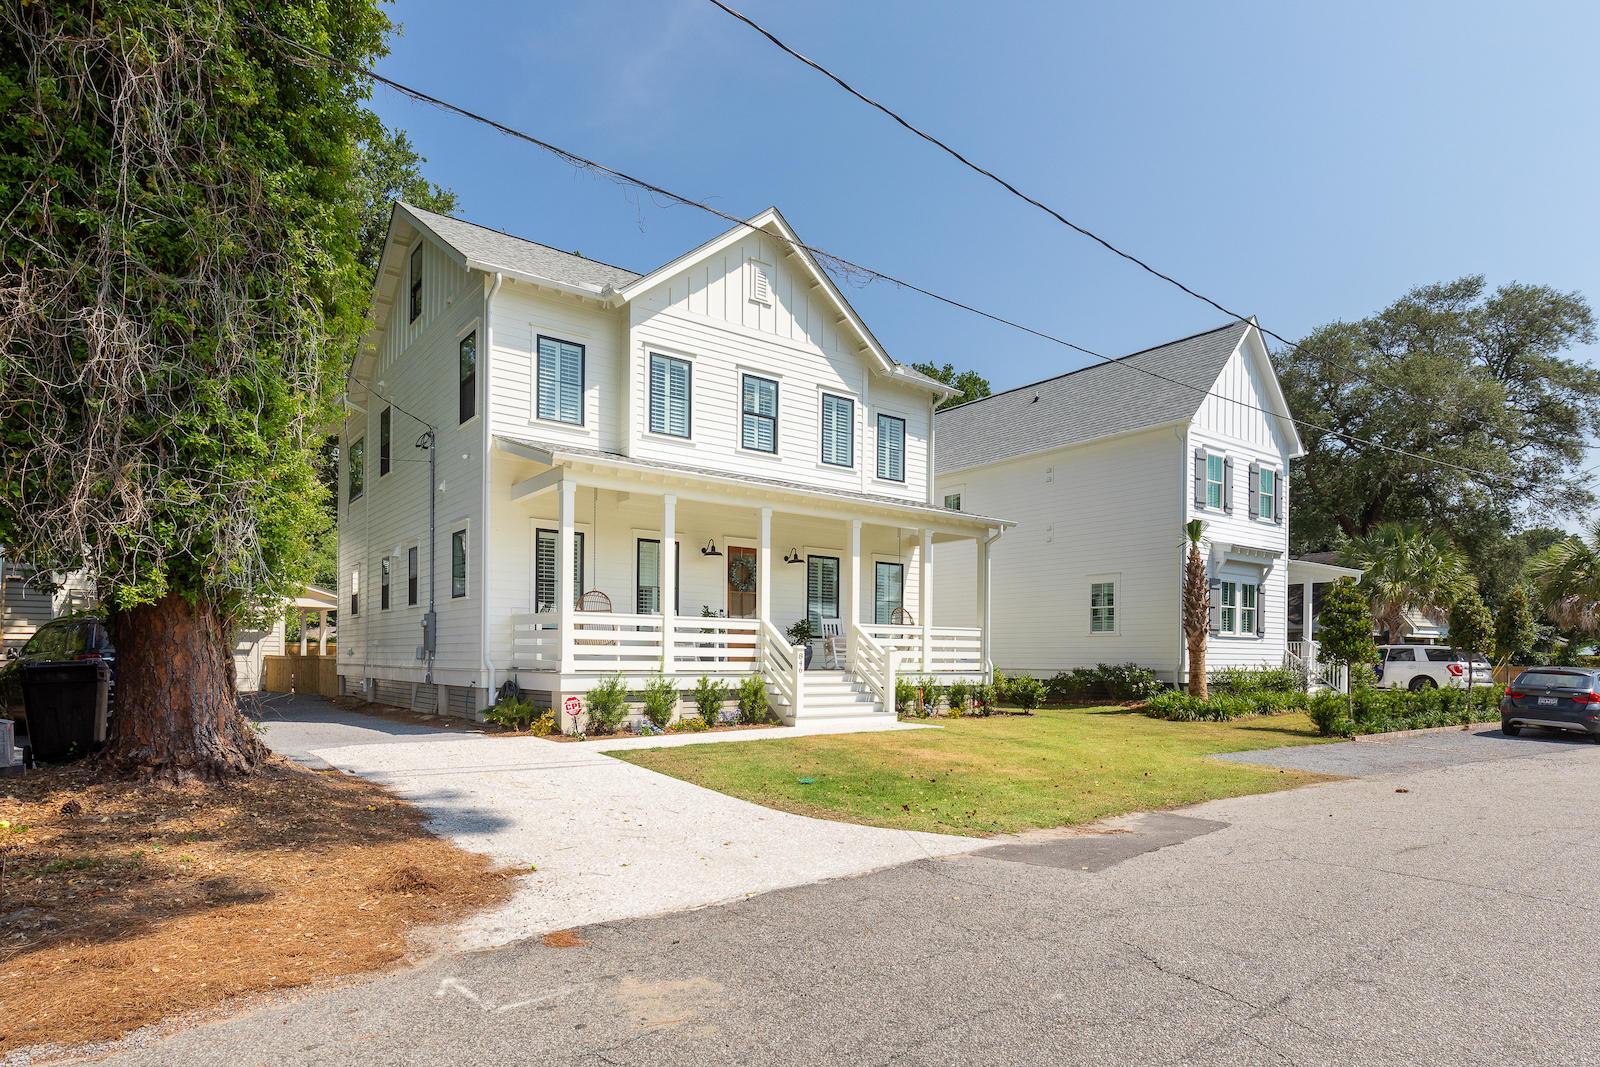 Old Mt Pleasant Homes For Sale - 546 Center, Mount Pleasant, SC - 31